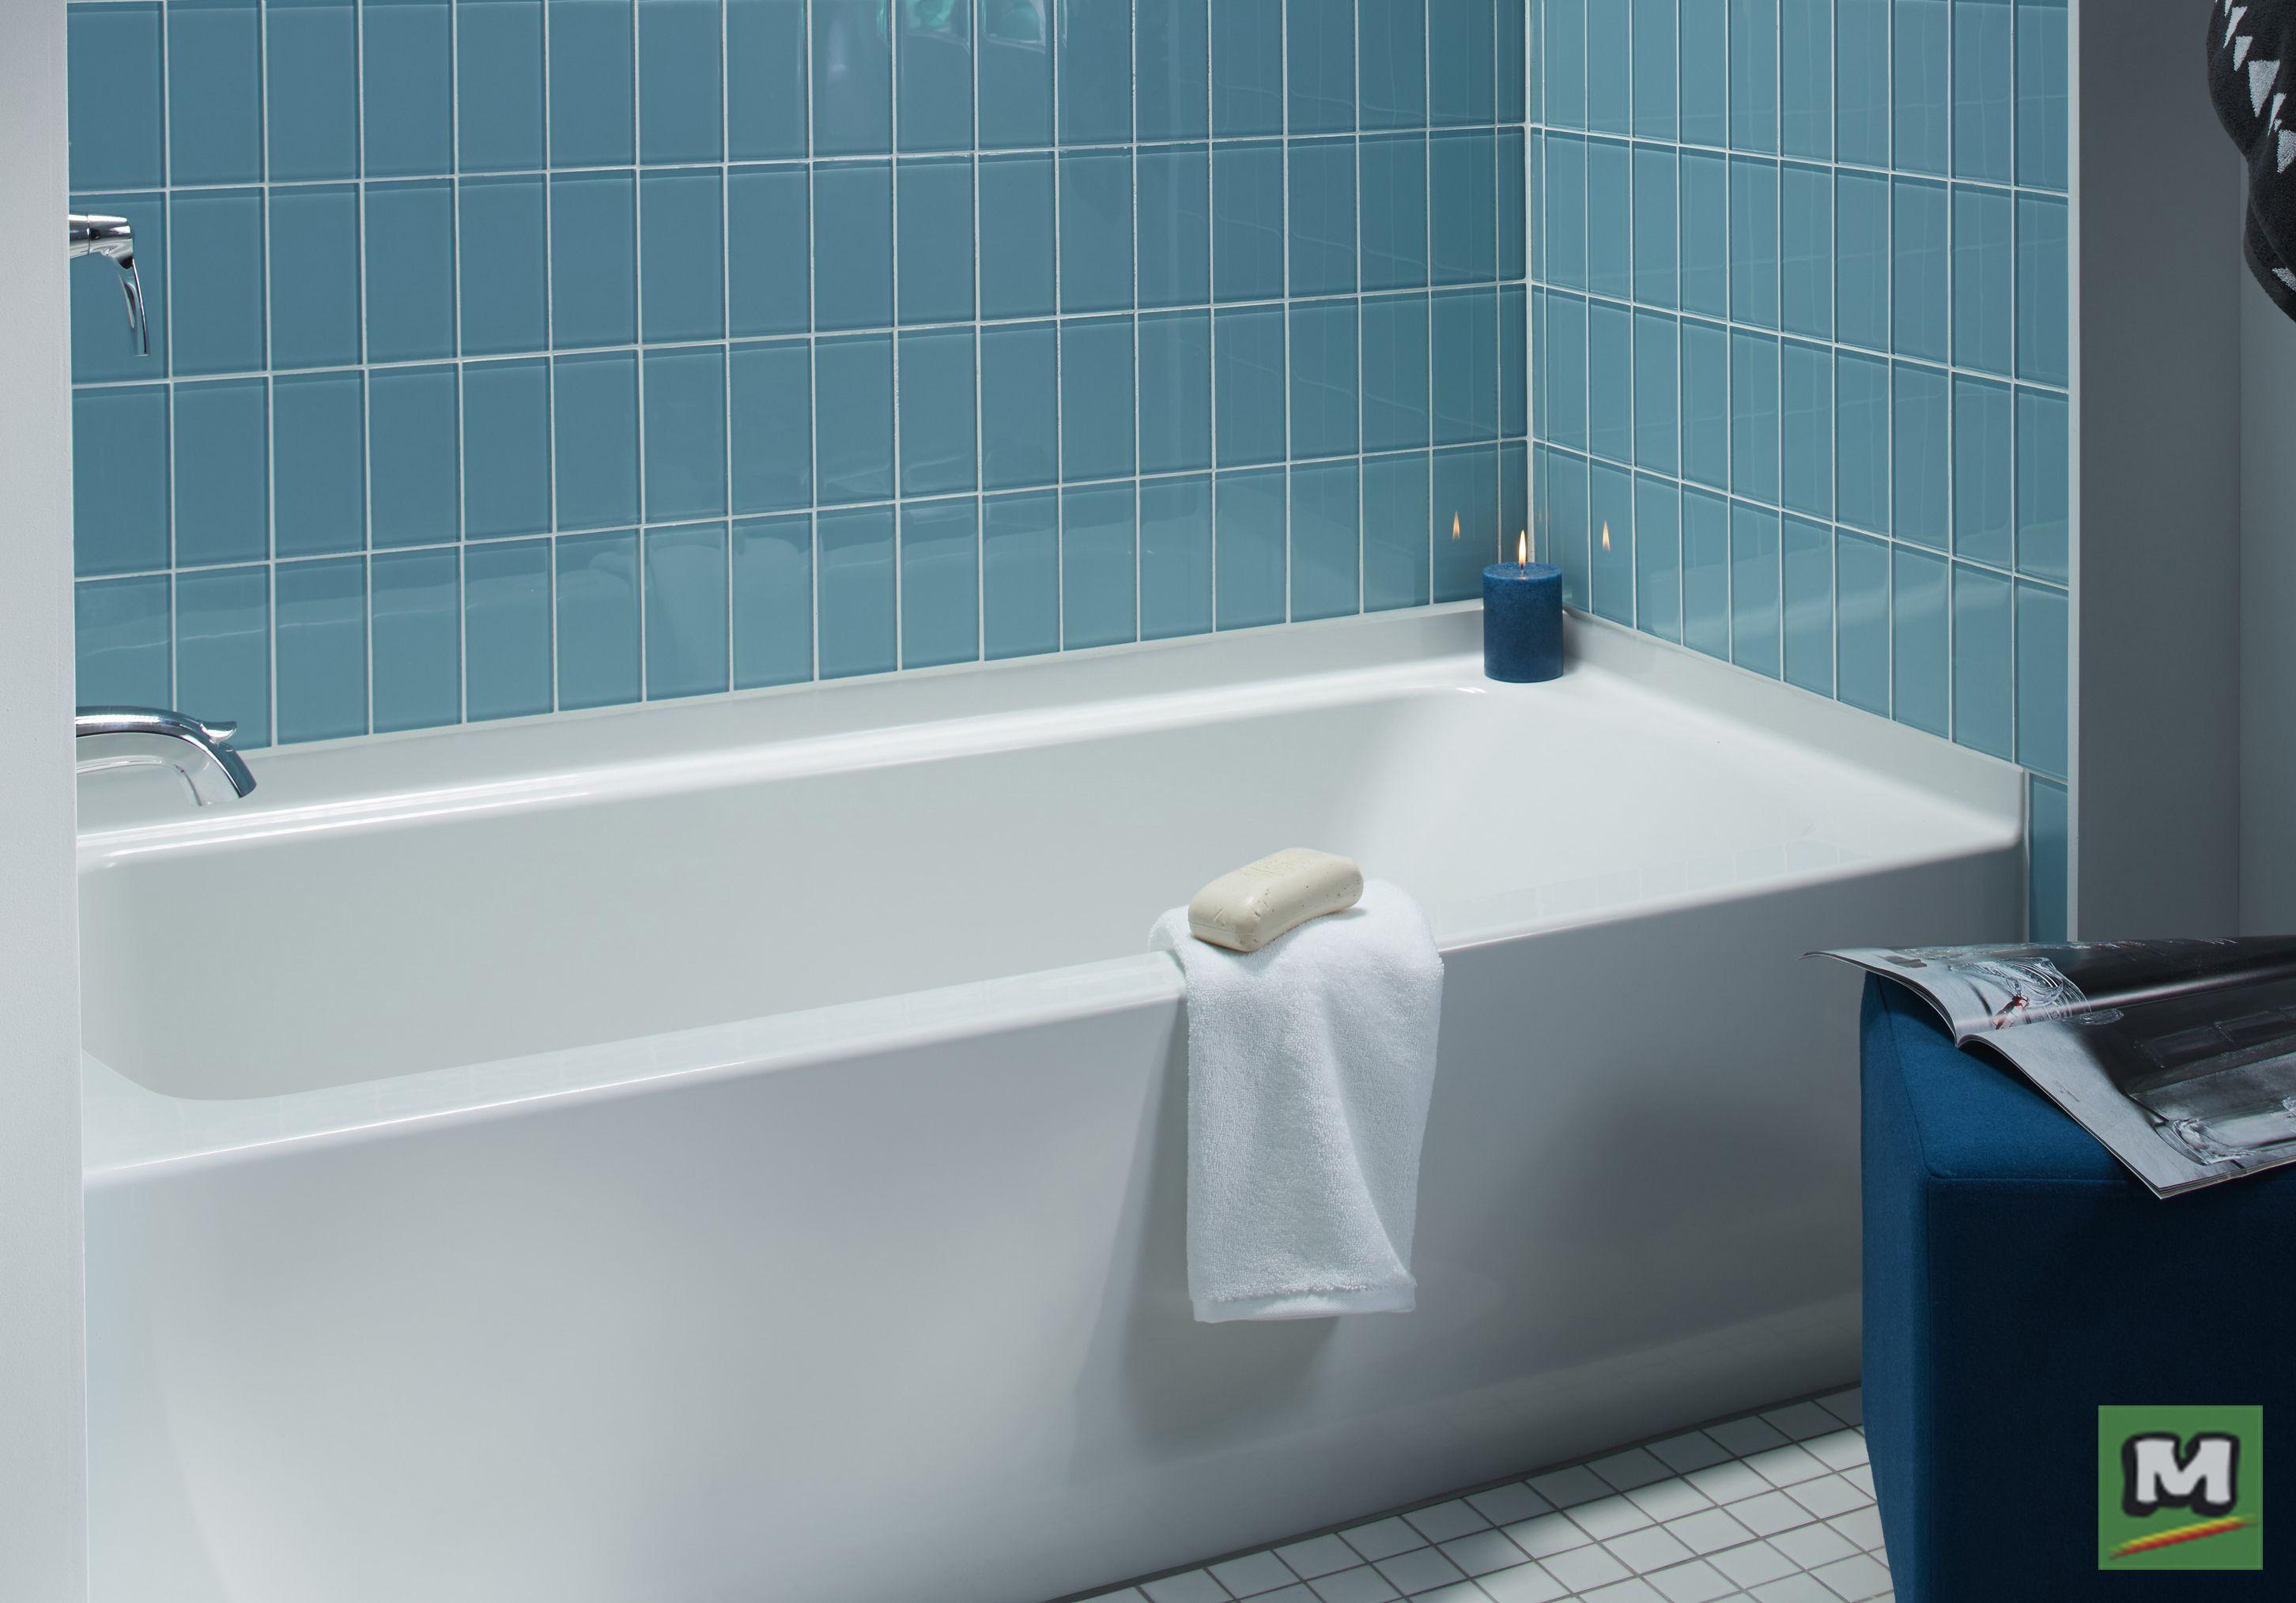 Attractive 60 X 30 Bathtub Images - Bathtub Ideas - dilata.info